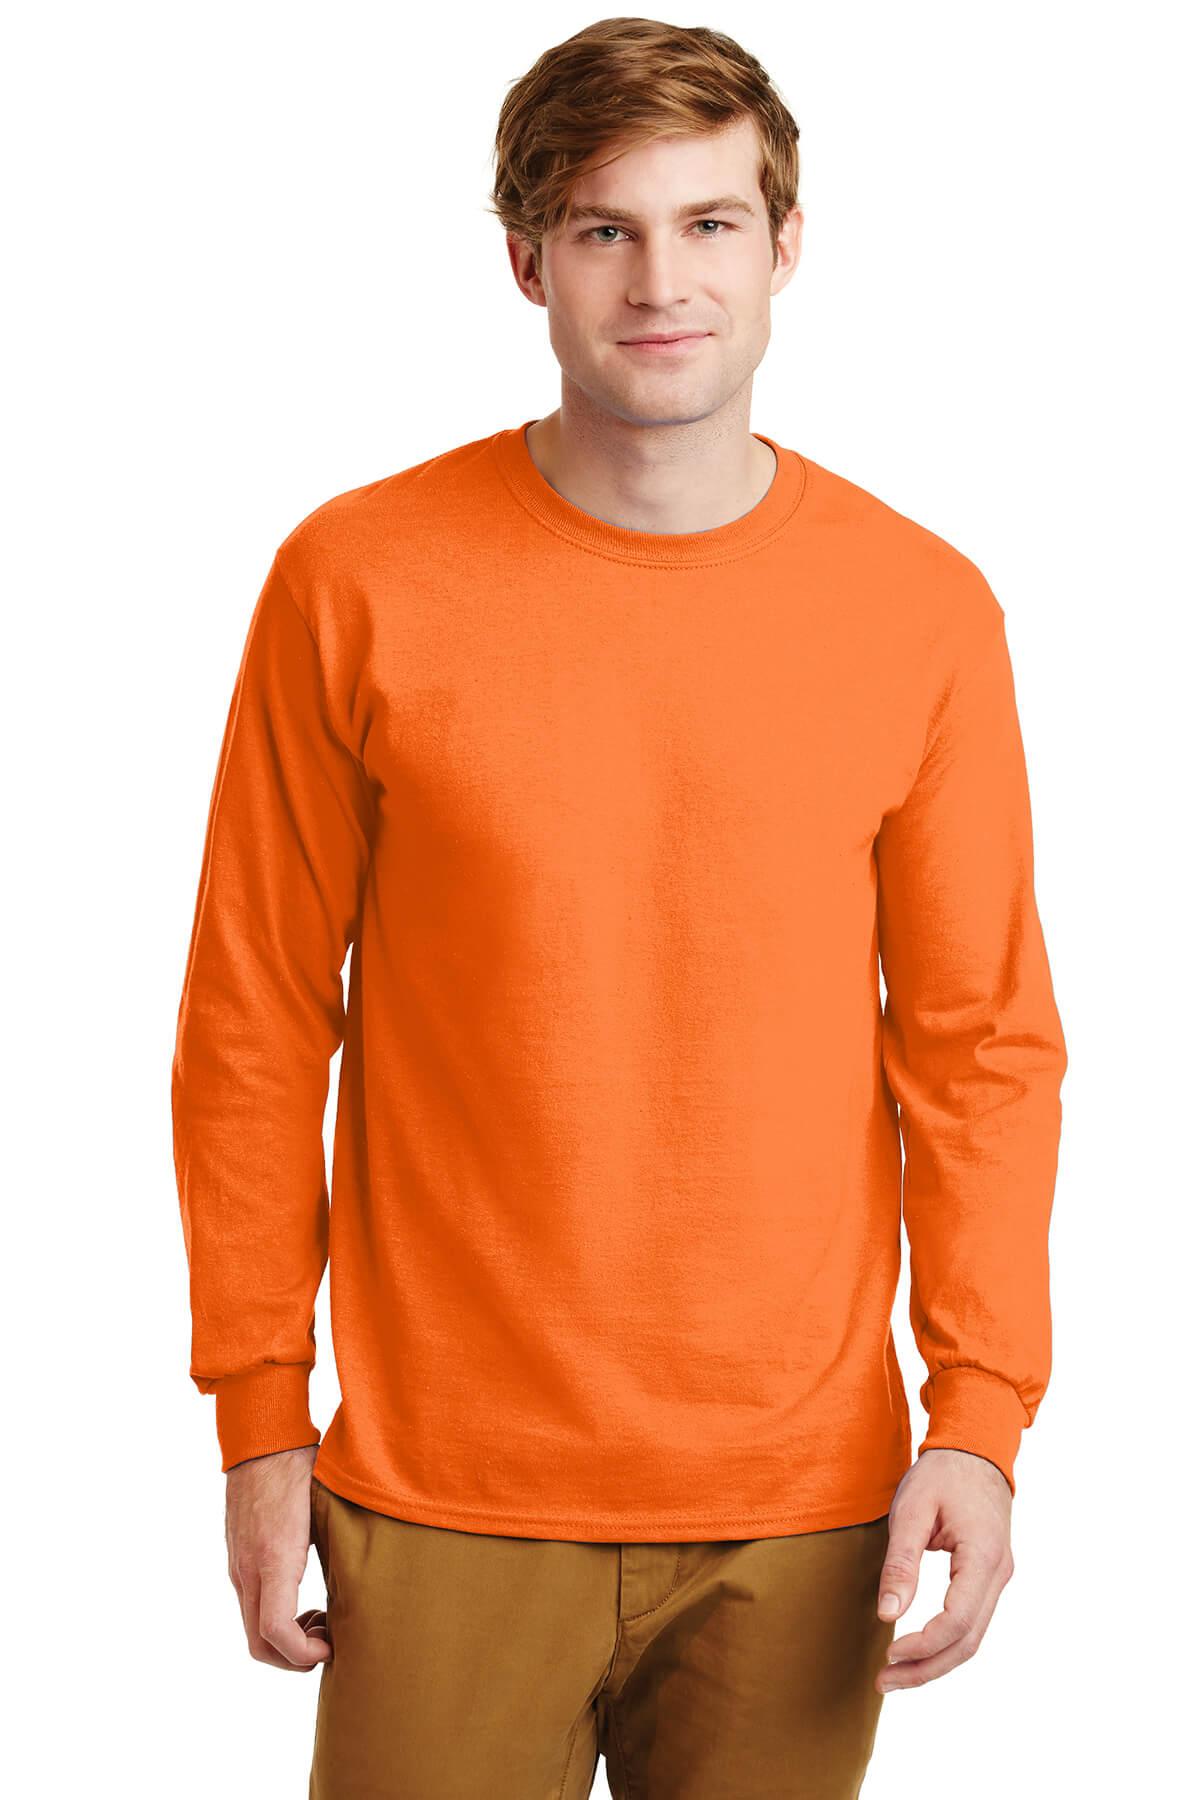 g2400-southern-orange-2